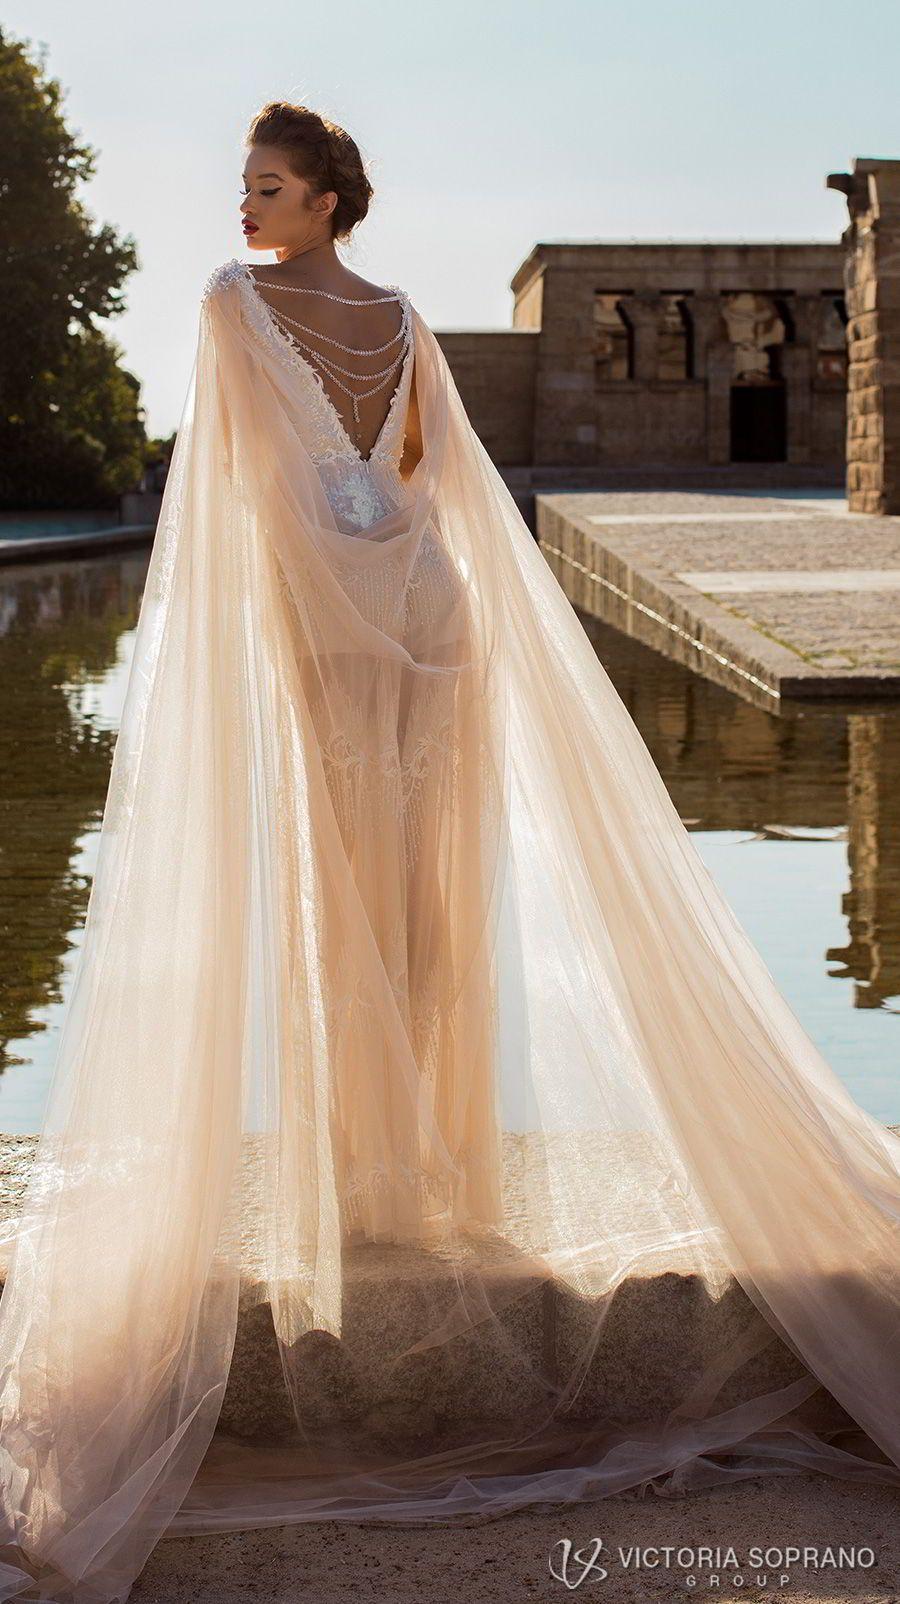 Victoria Soprano 2018 Wedding Dresses The One Bridal Collection